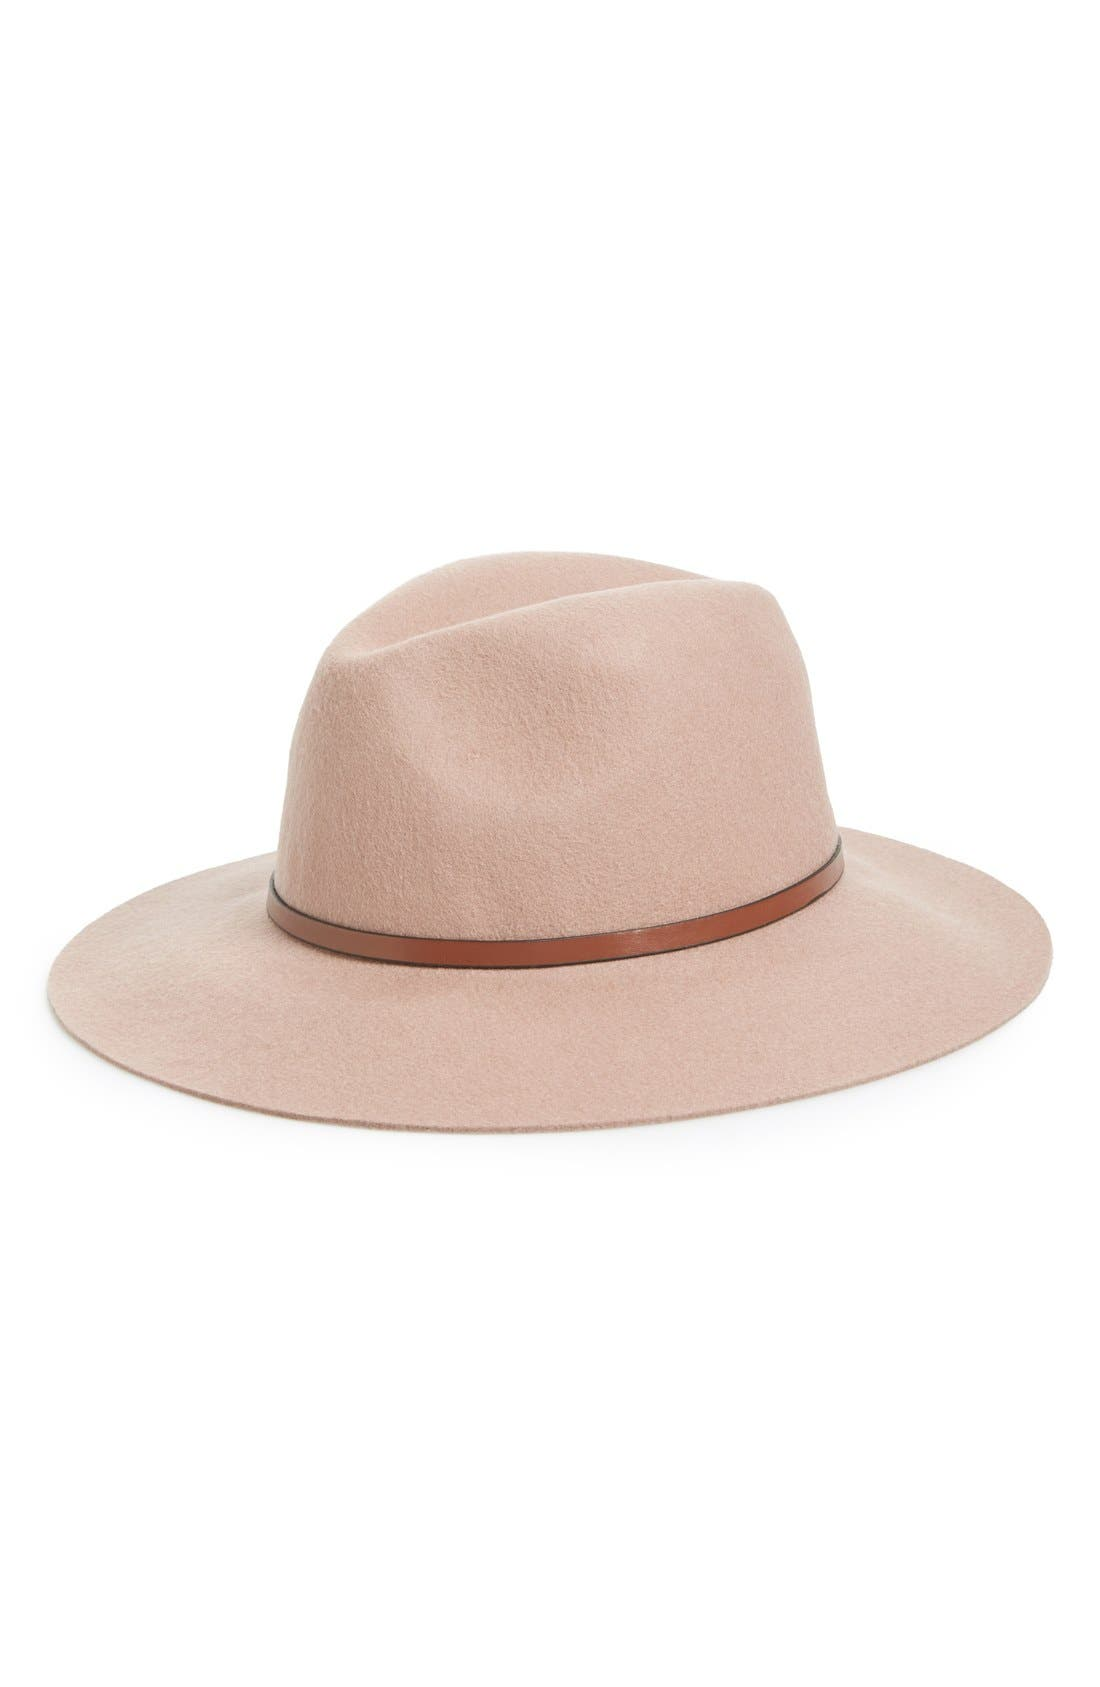 Alternate Image 1 Selected - Hinge Faux Leather Trim Wool Felt Panama Hat